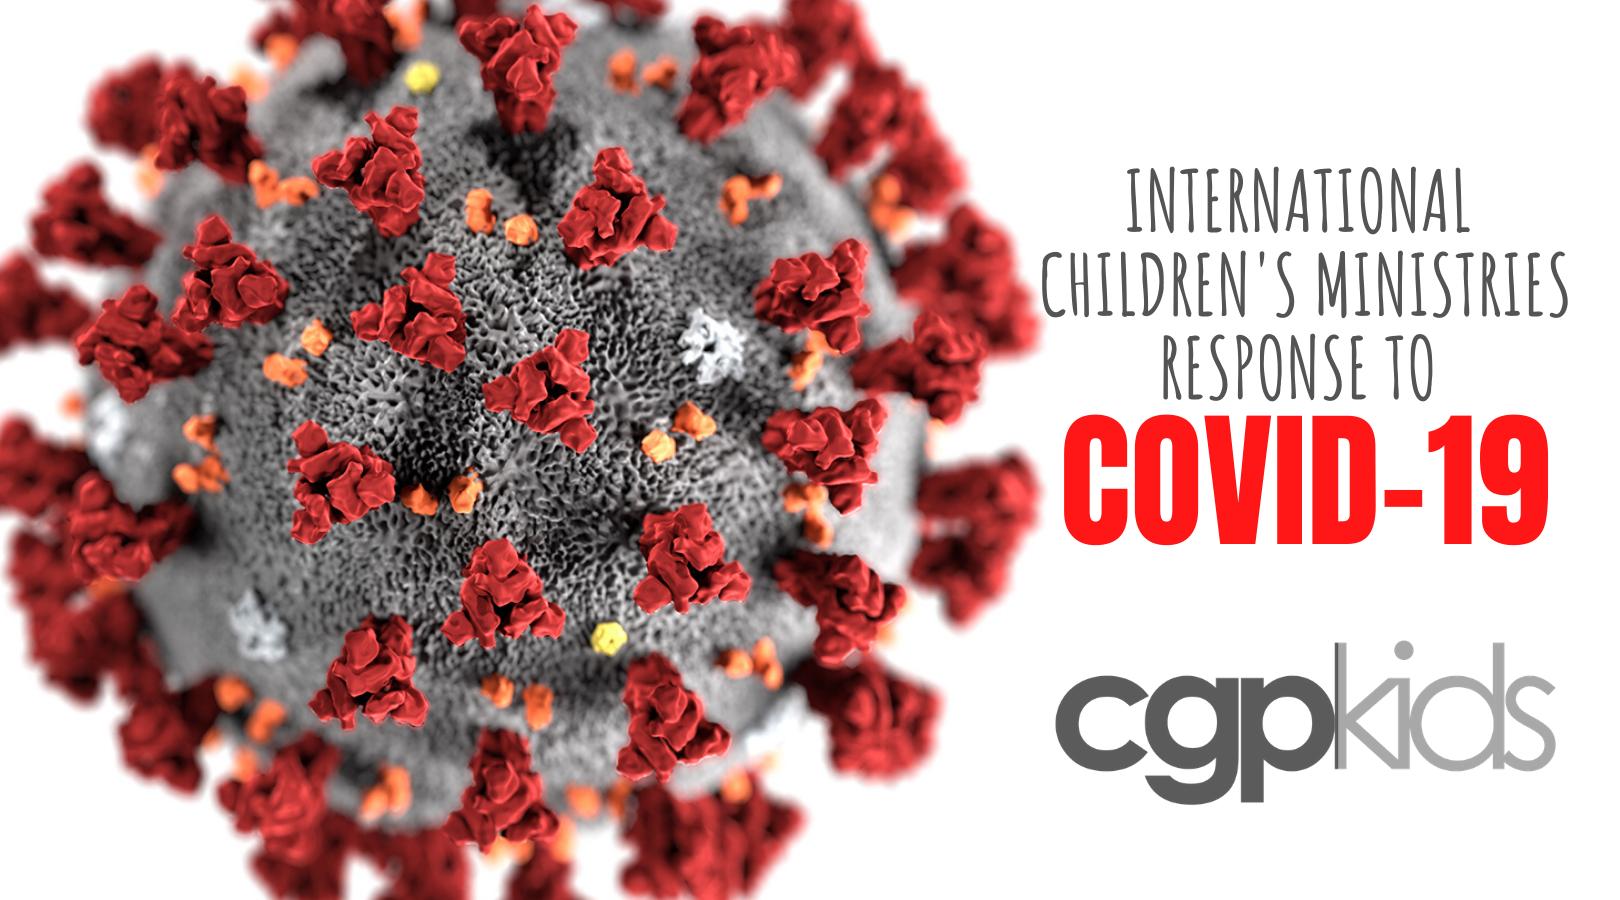 International Children's Ministries Response to COVID-19 Pandemic